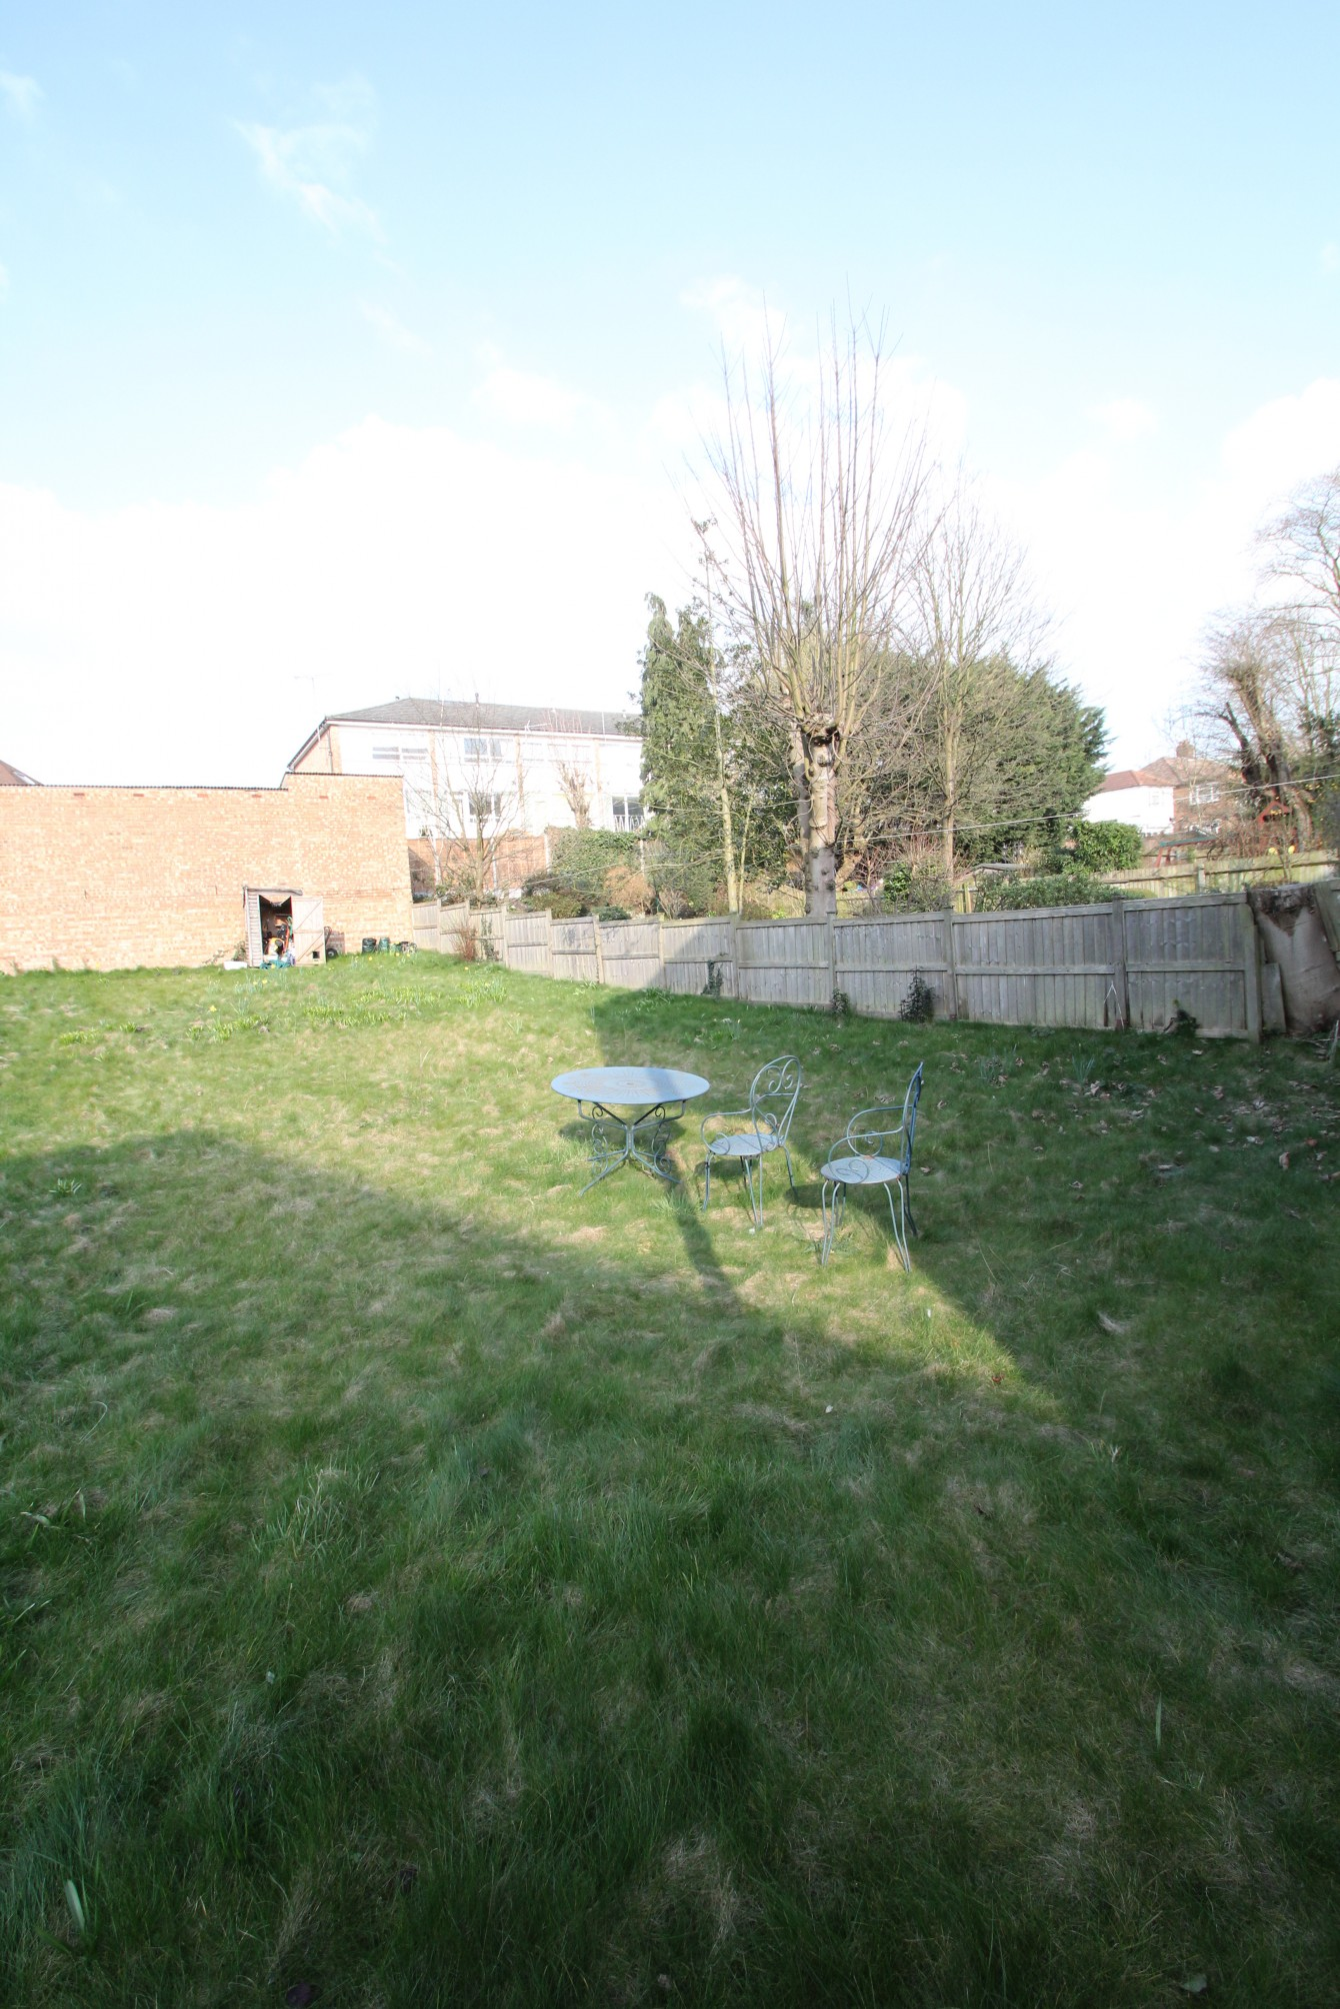 Images for Finchley, London EAID:c8d5f0ae42d594d169bca90f3b8b041a BID:1